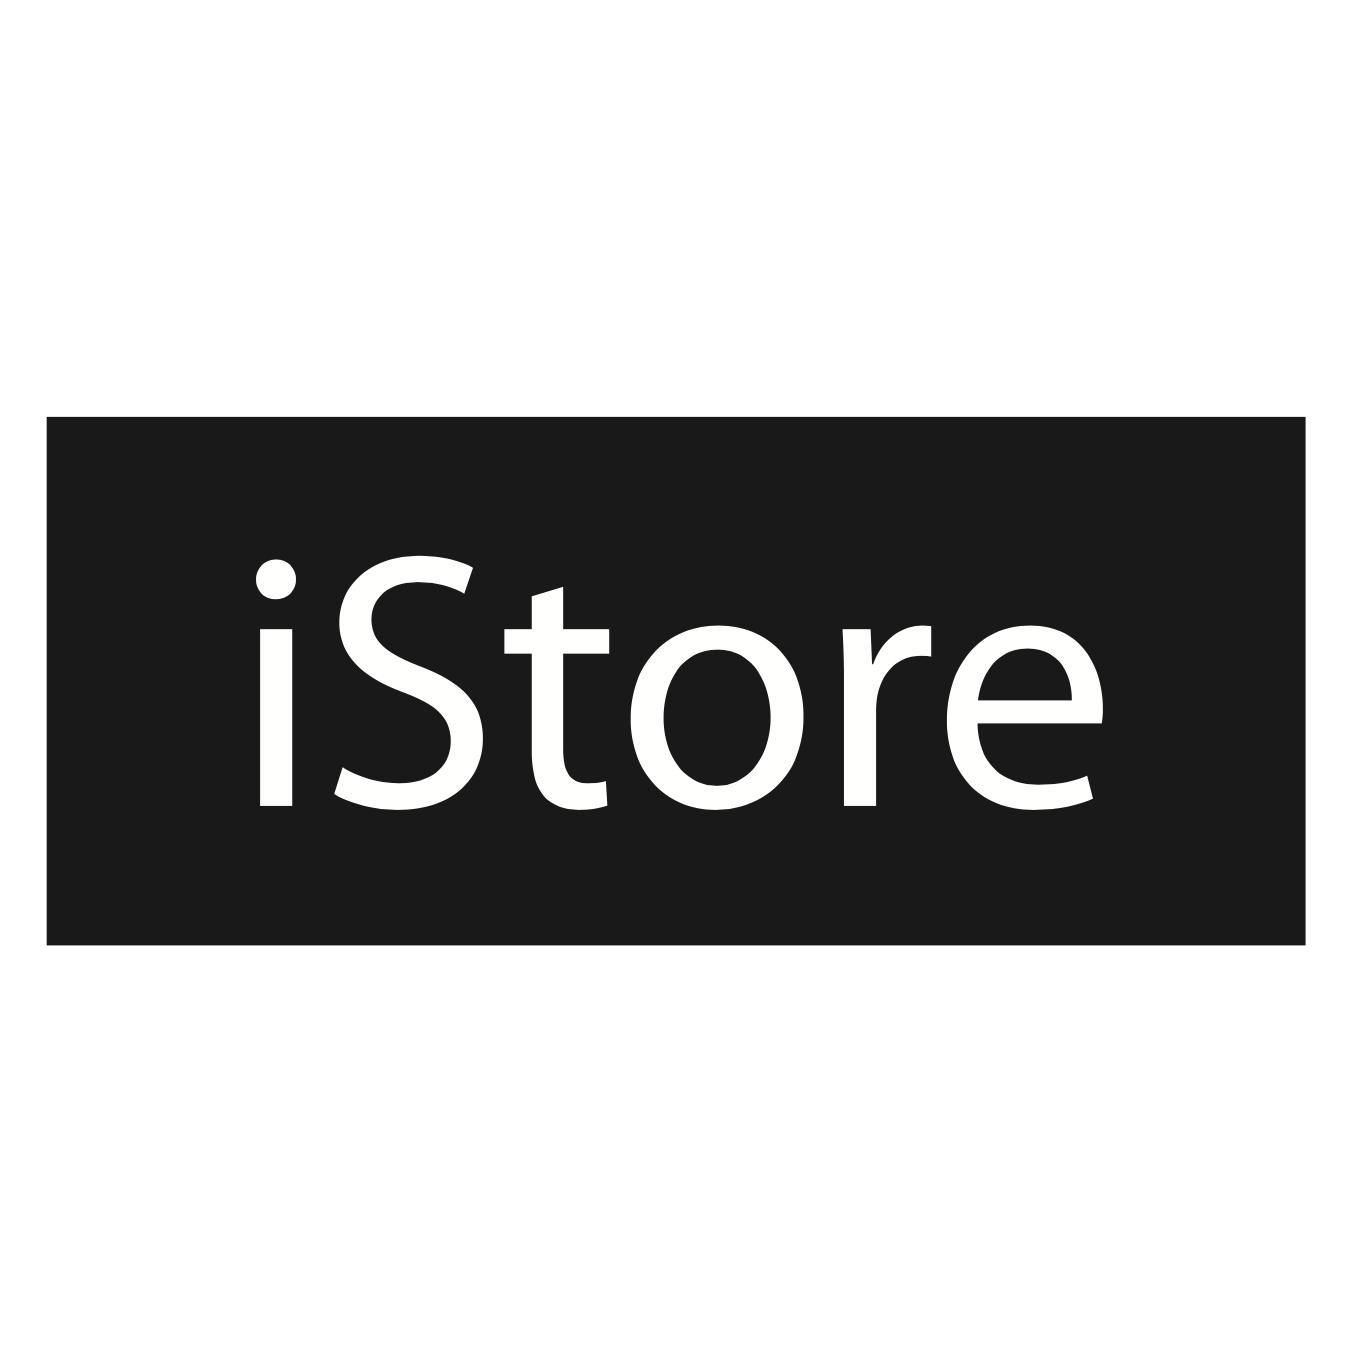 Karat Case for iPhone 6 / 6s Plus - Gold Leaf